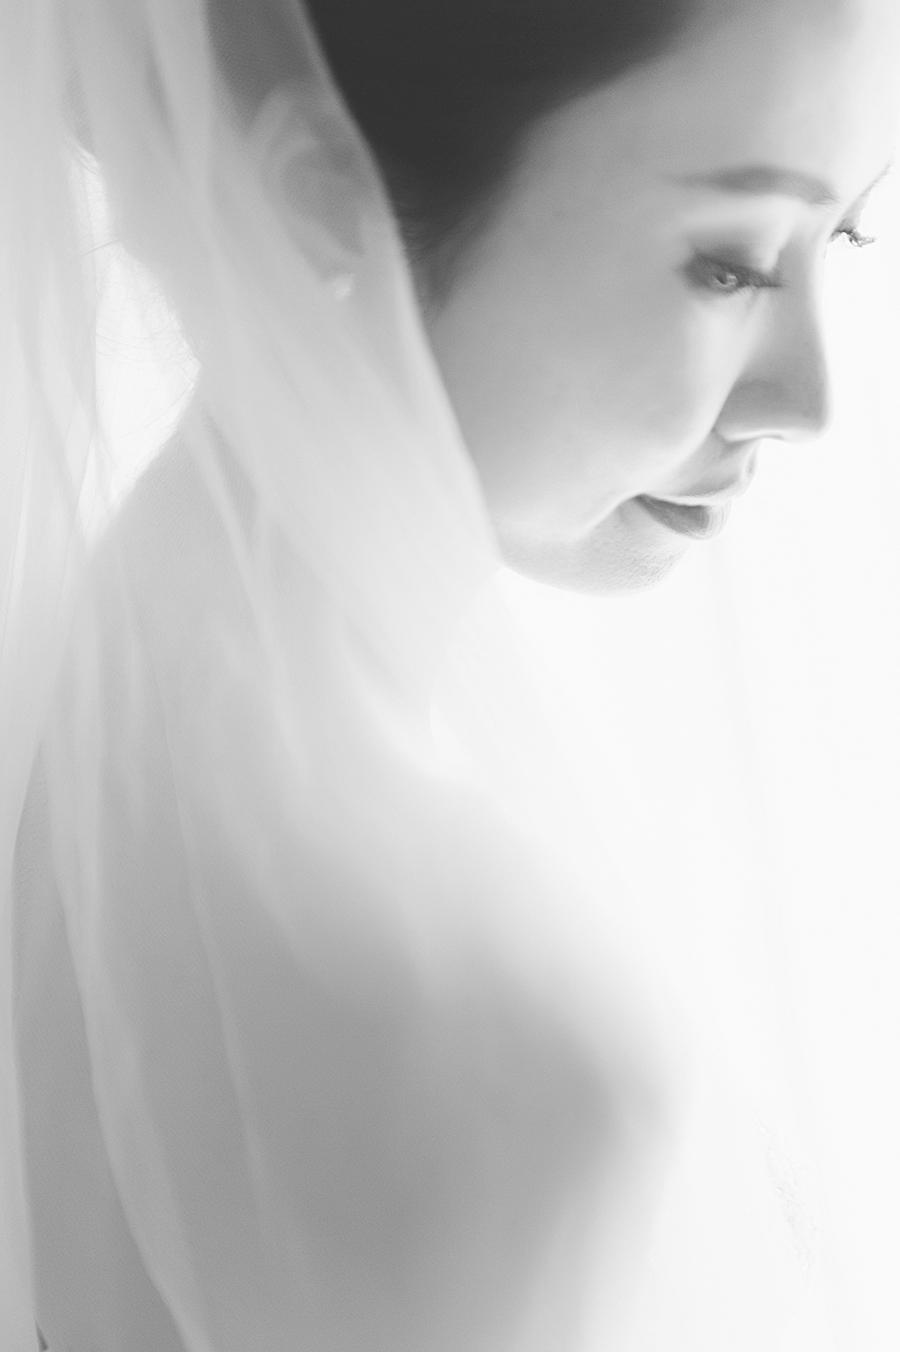 Nickchang-fineart-wedding-4